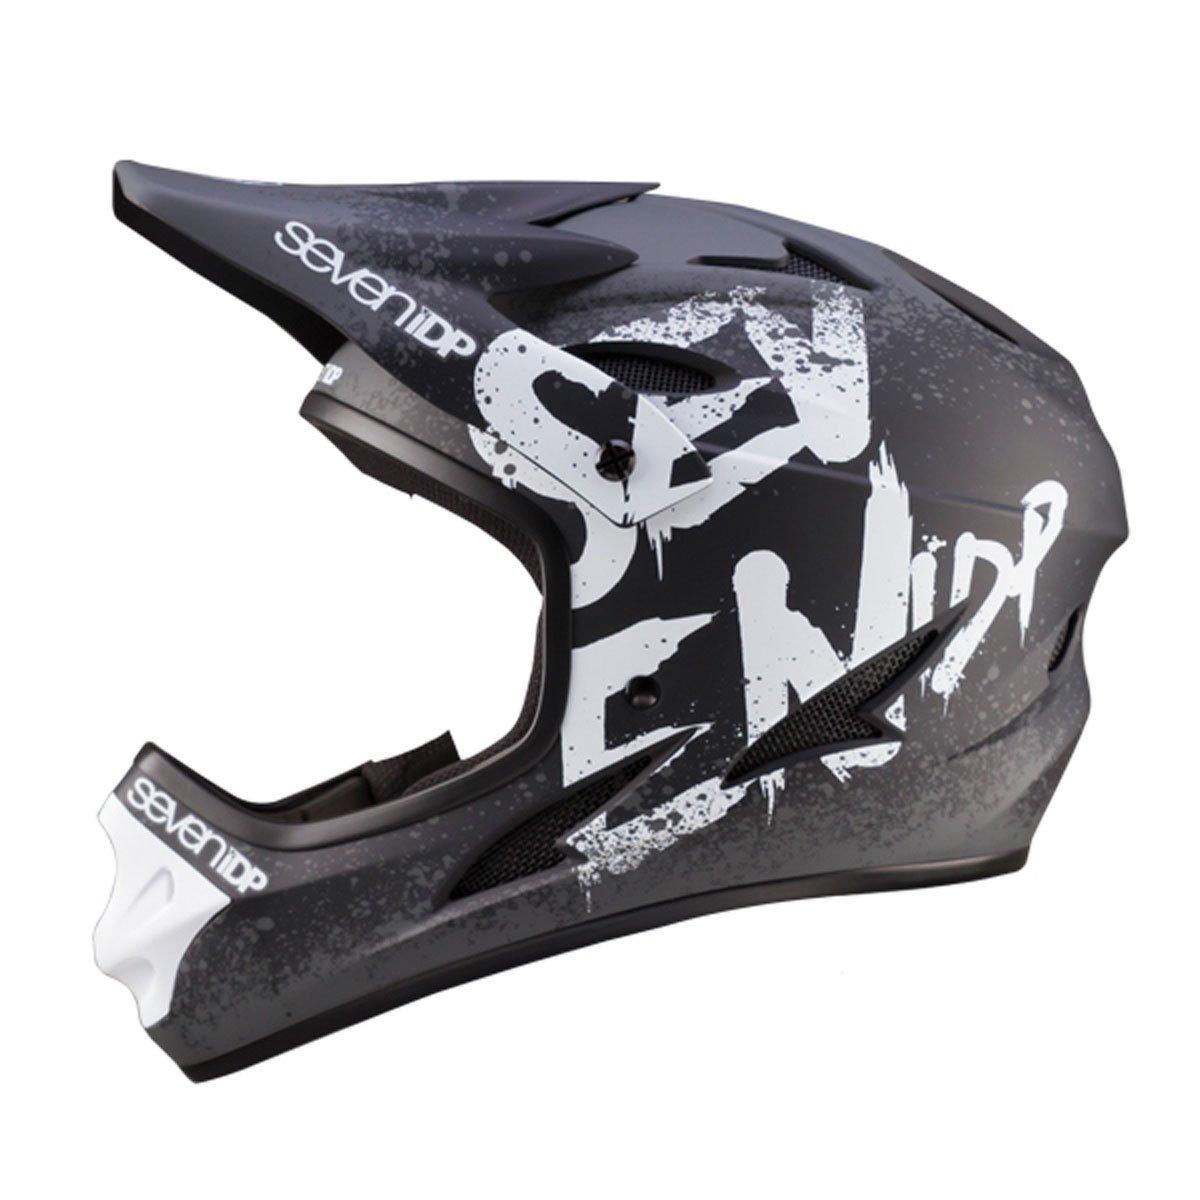 7 Protection M1 Helmet Matte Black//Graphite S 7706-50-520